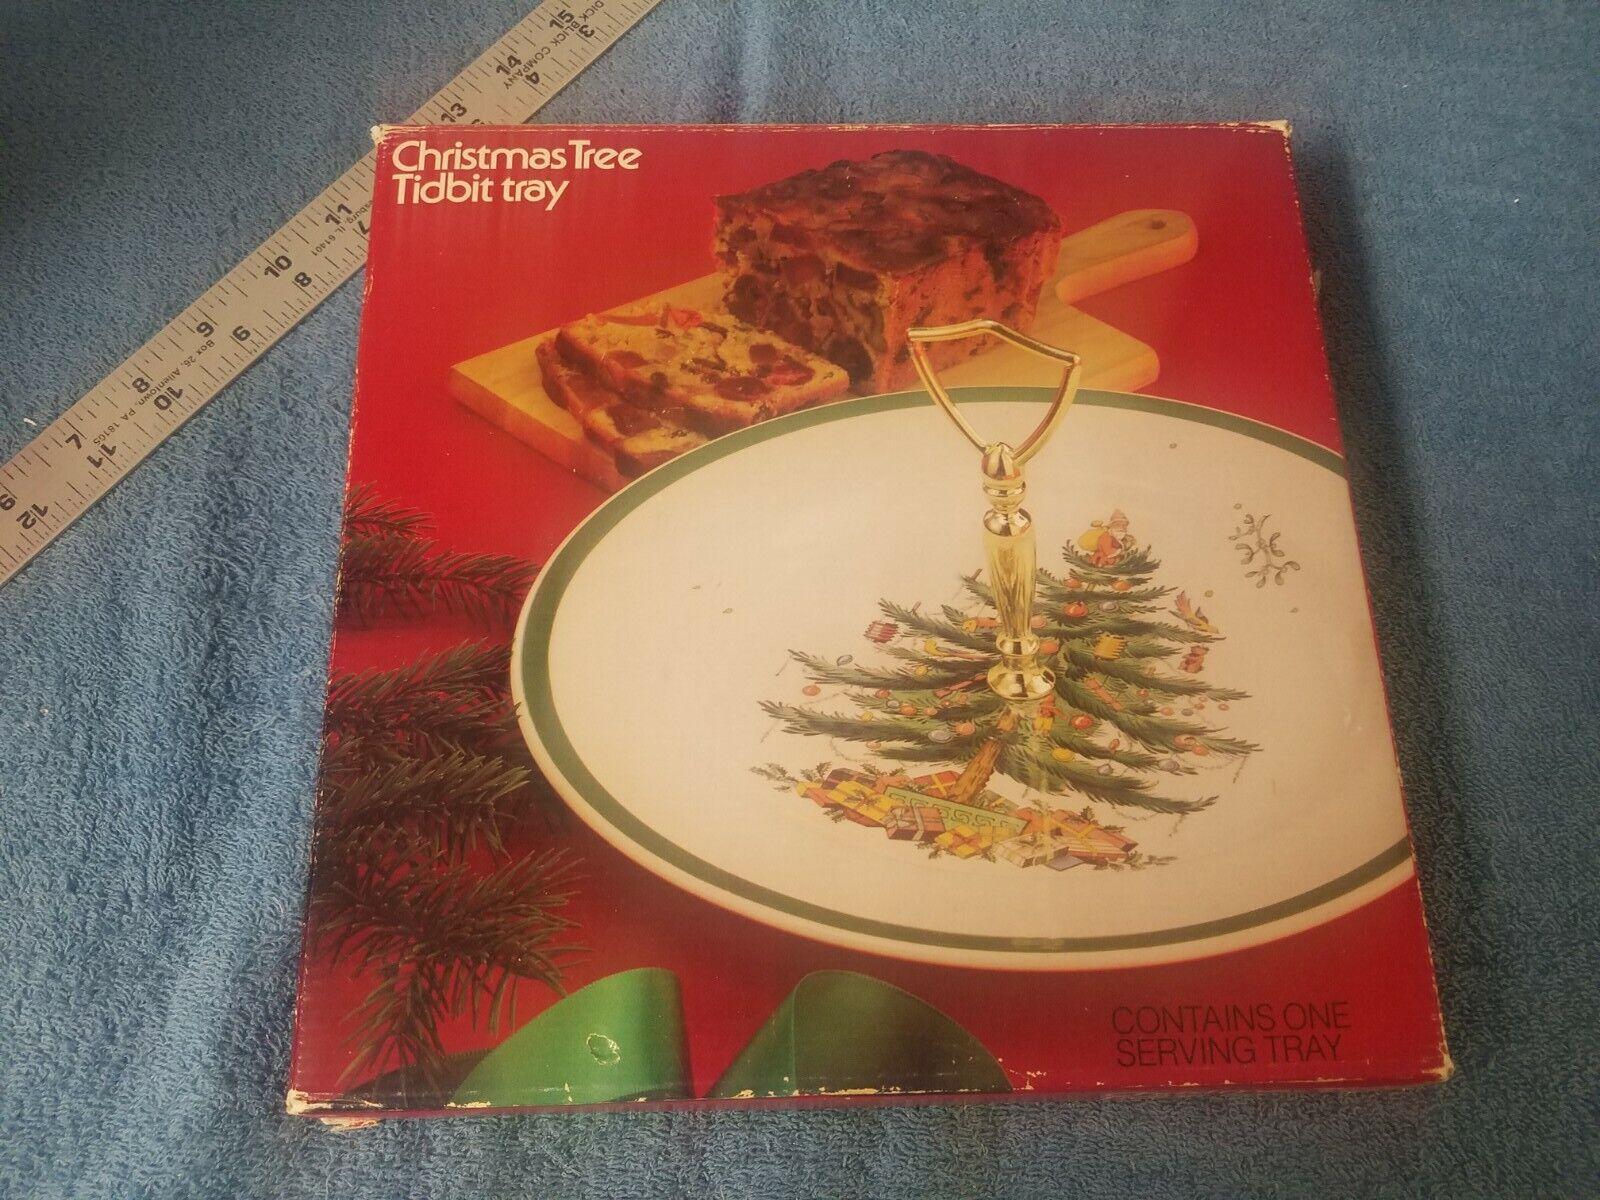 Cake Plate Vintage Spode Christmas Tree Square Serving Platter